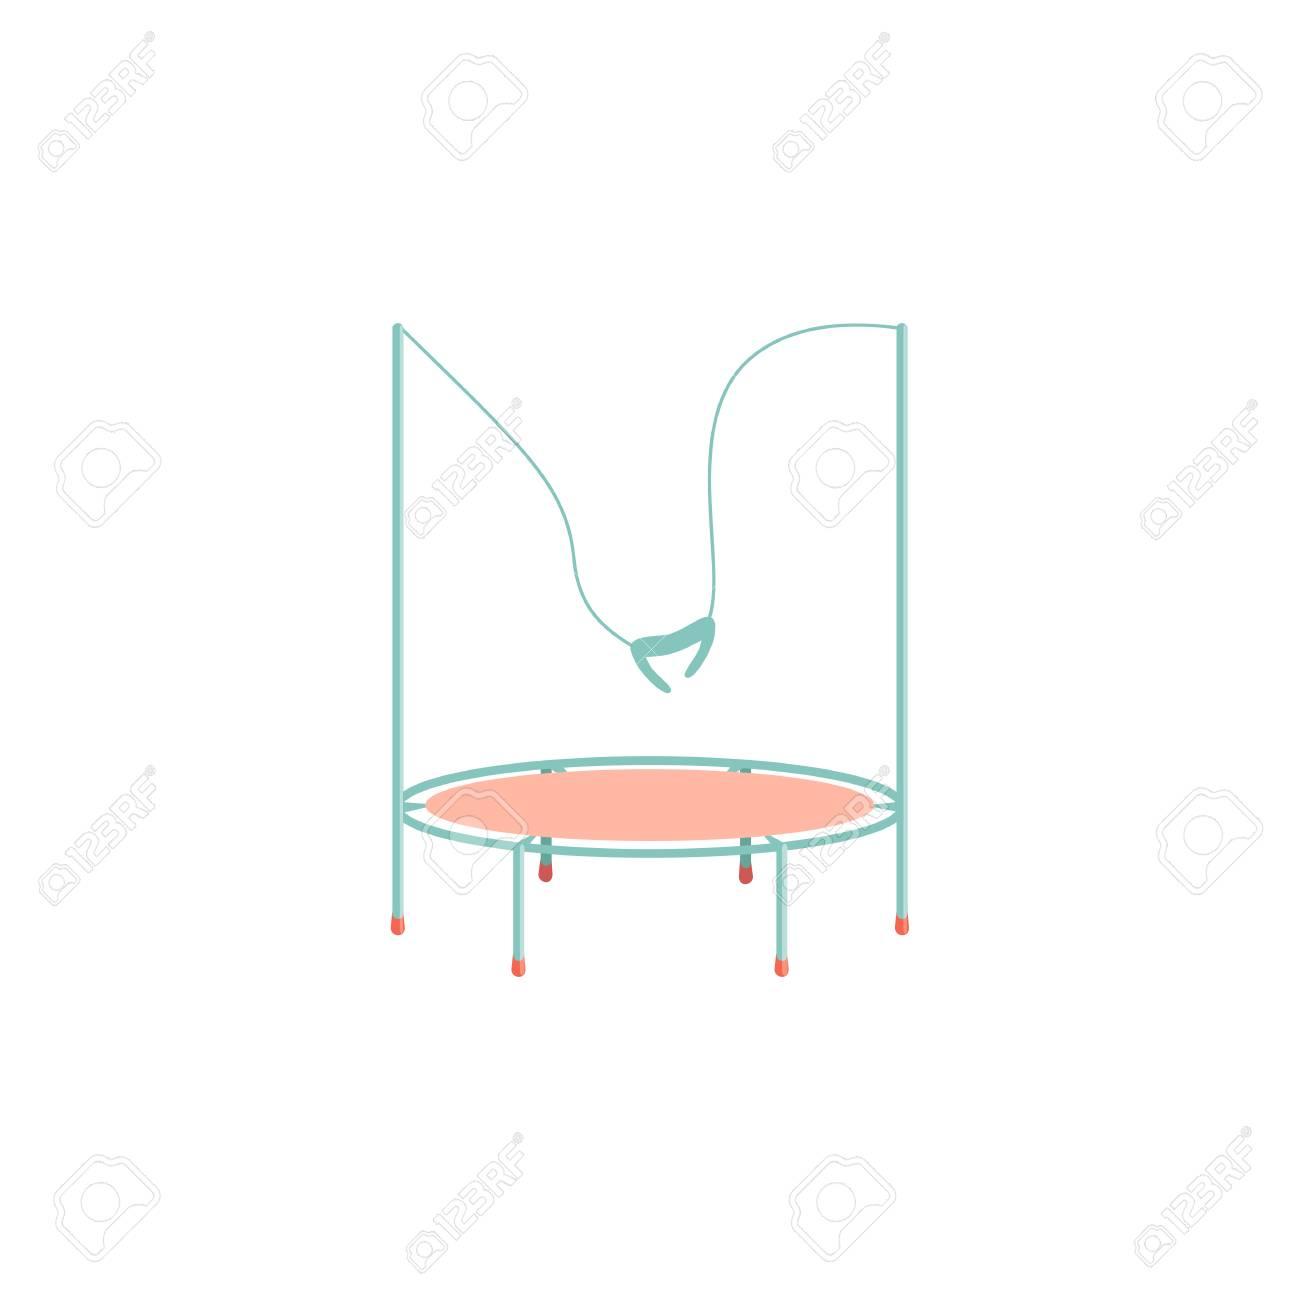 Cartoon trampoline icon. Kids playground. Isolated vector illustration - 101642277